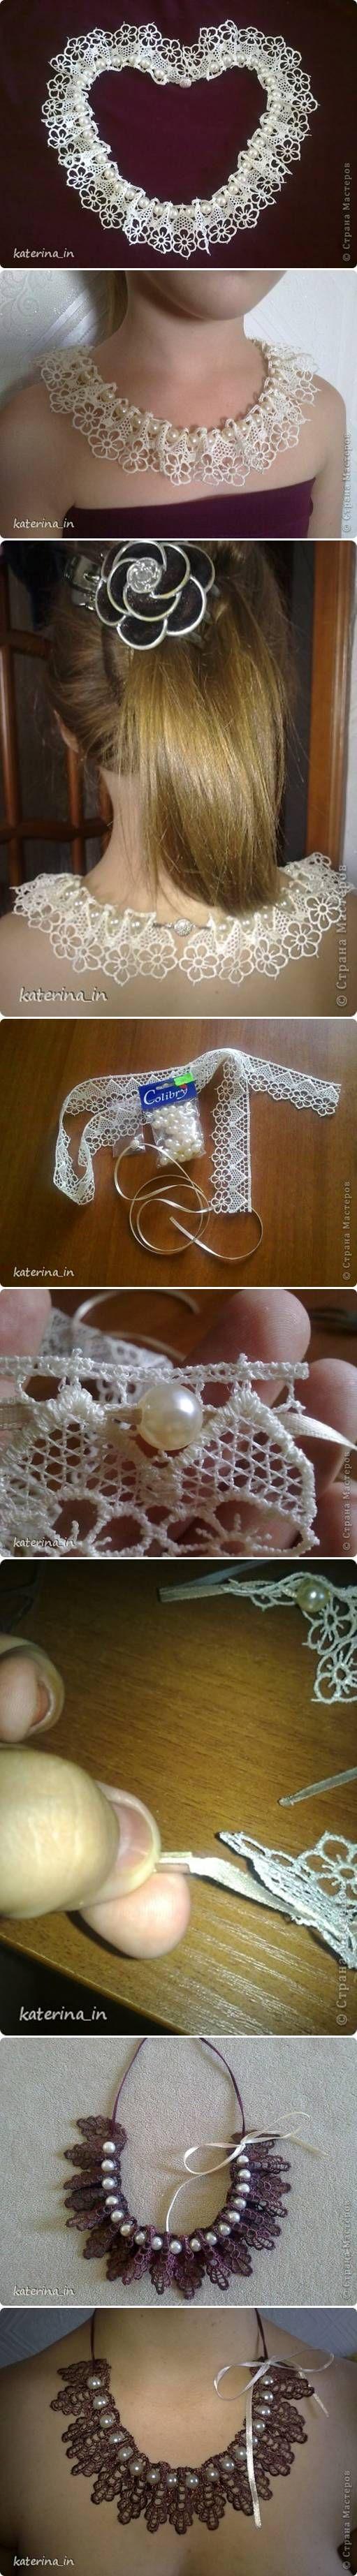 DIY Sew Lace Beads Collar